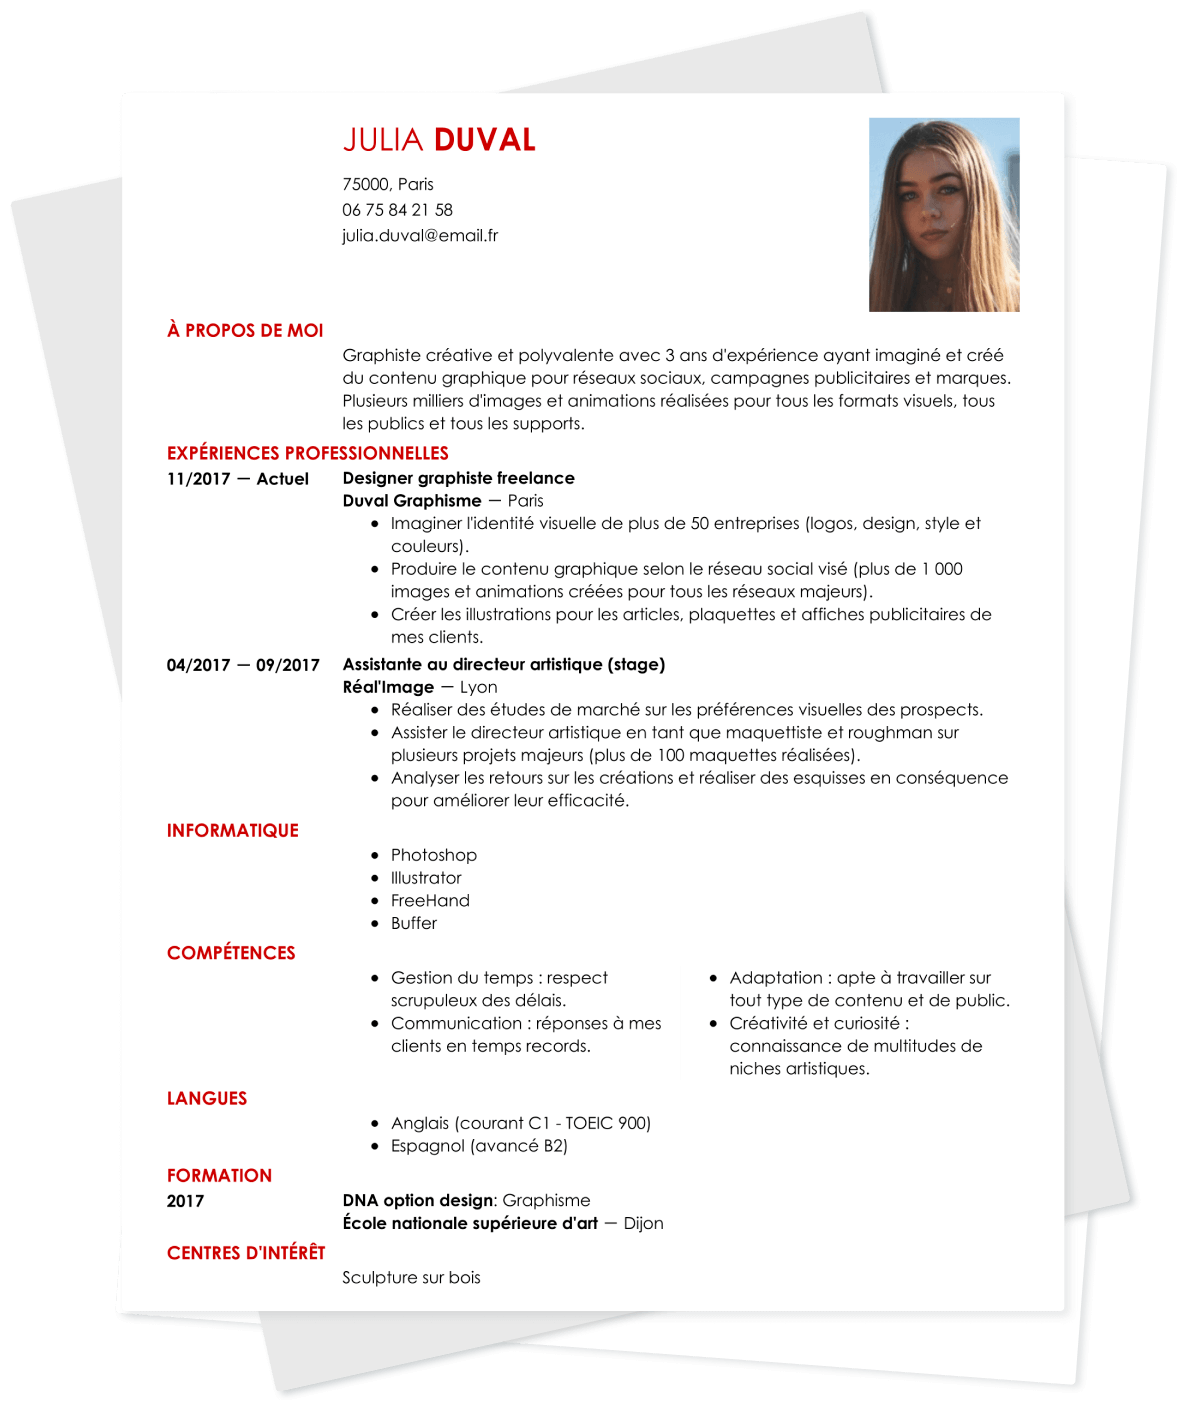 cv administrateur systeme pdf